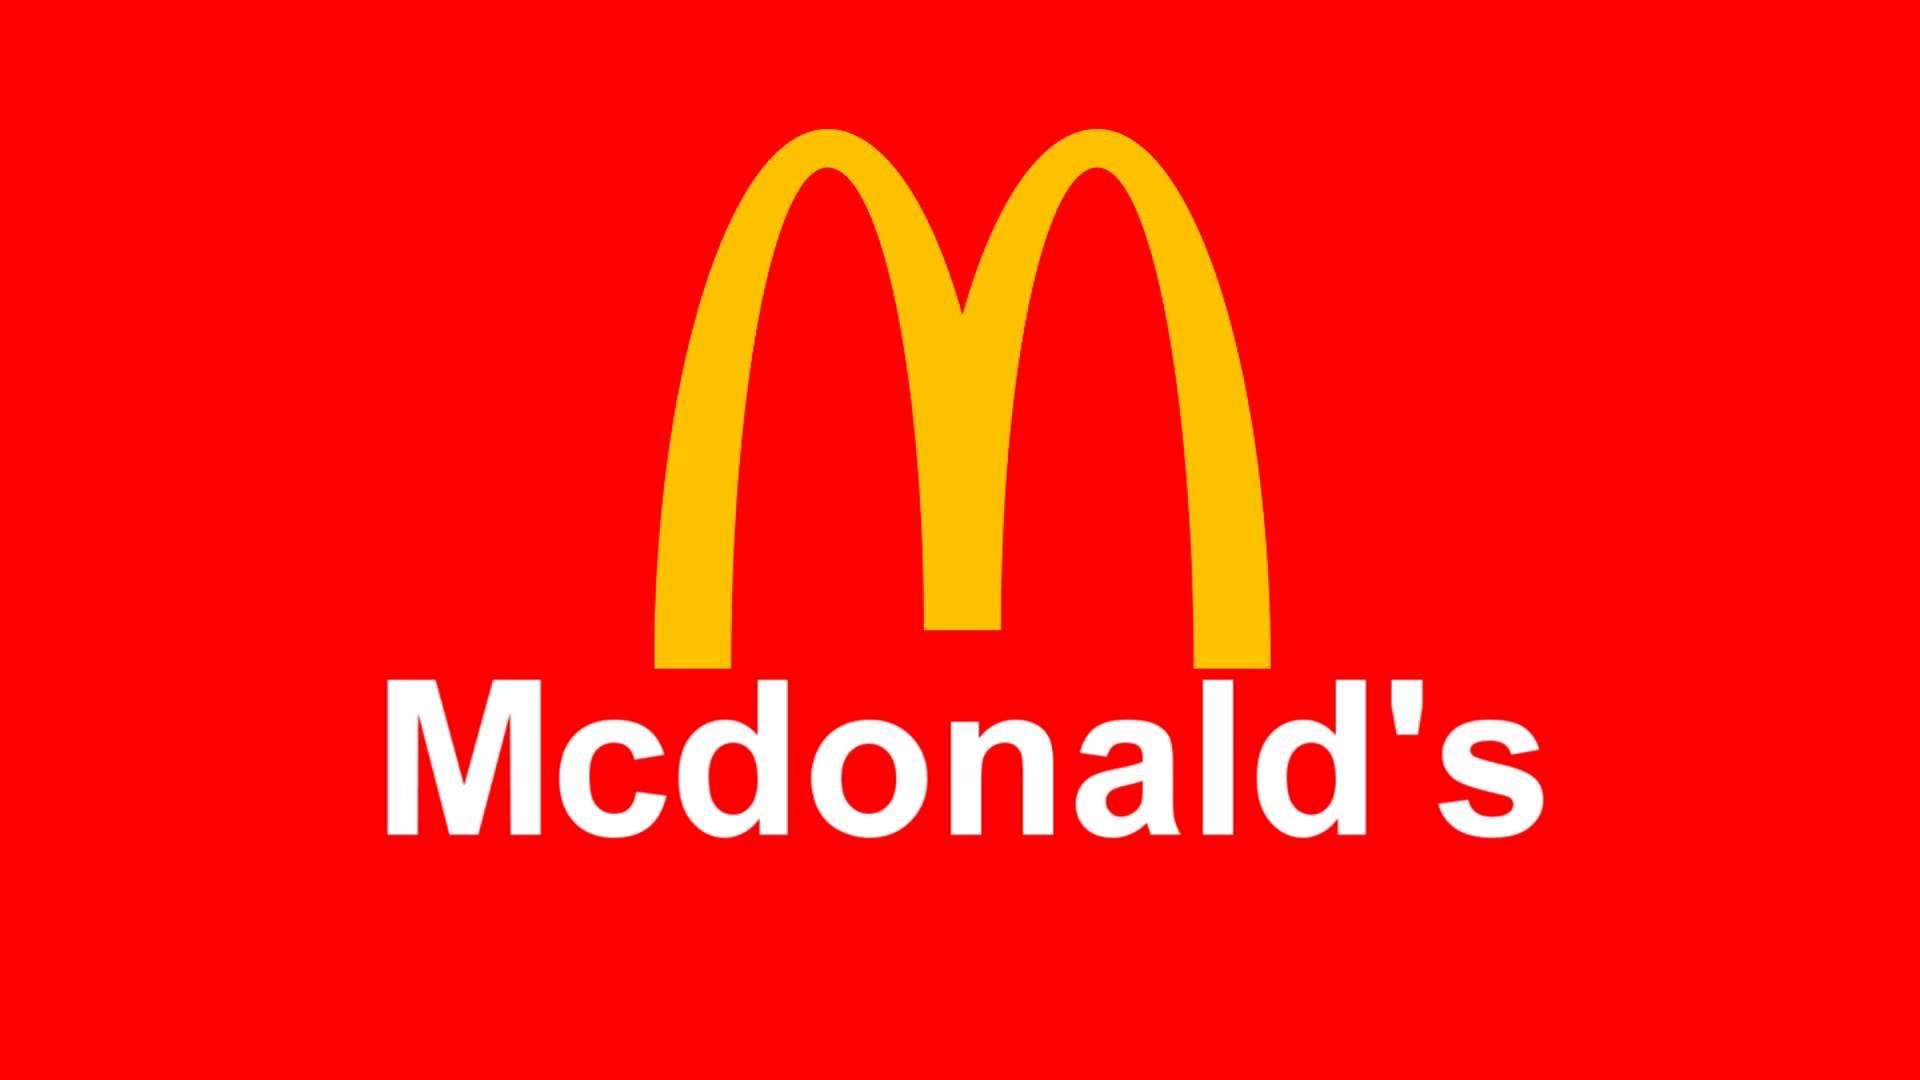 McDonalds Will Be Sponsoring The StarCraft 2 World